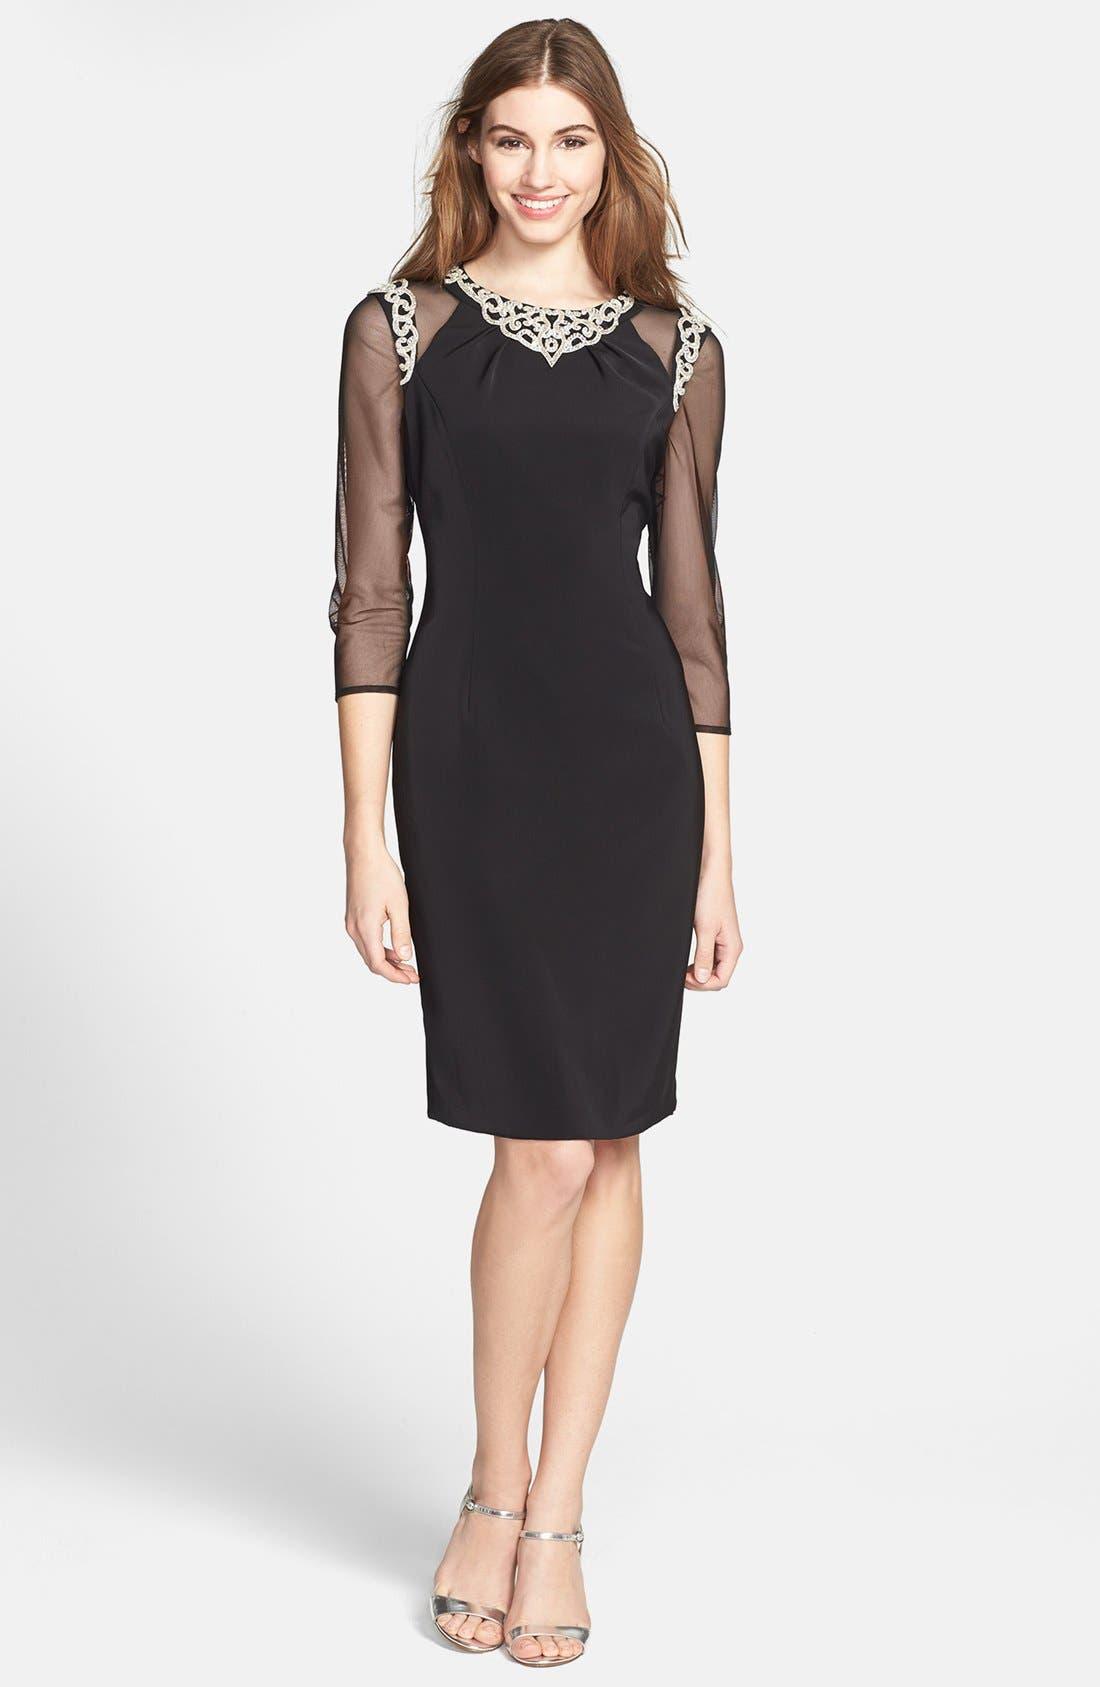 Alternate Image 1 Selected - Alex Evenings Embellished Mesh & Crepe Sheath Dress (Petite)